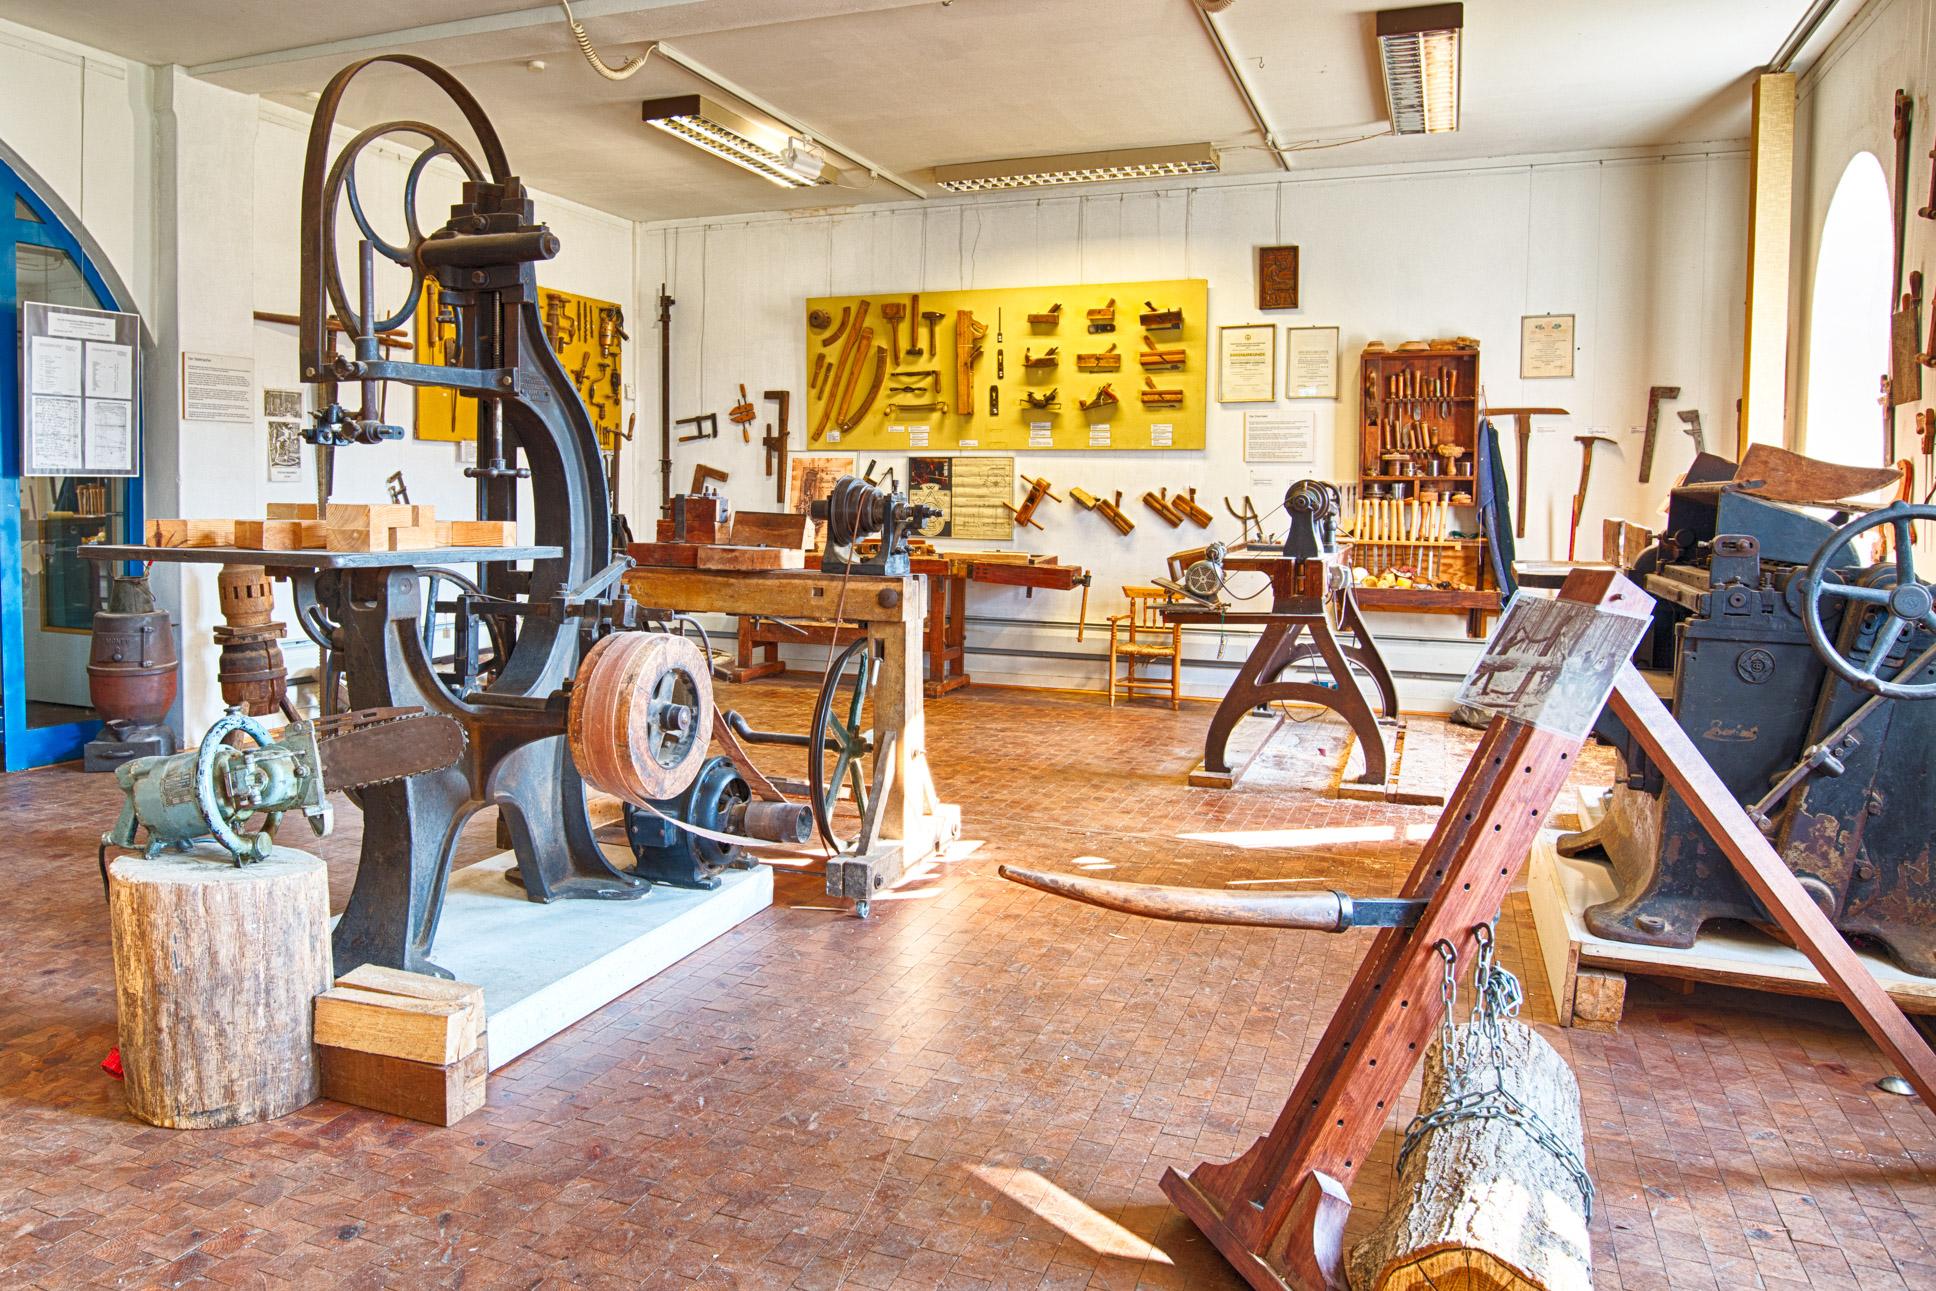 Handwerksmuseum-Horneburg-Rundgang2018-2866_HDR-25